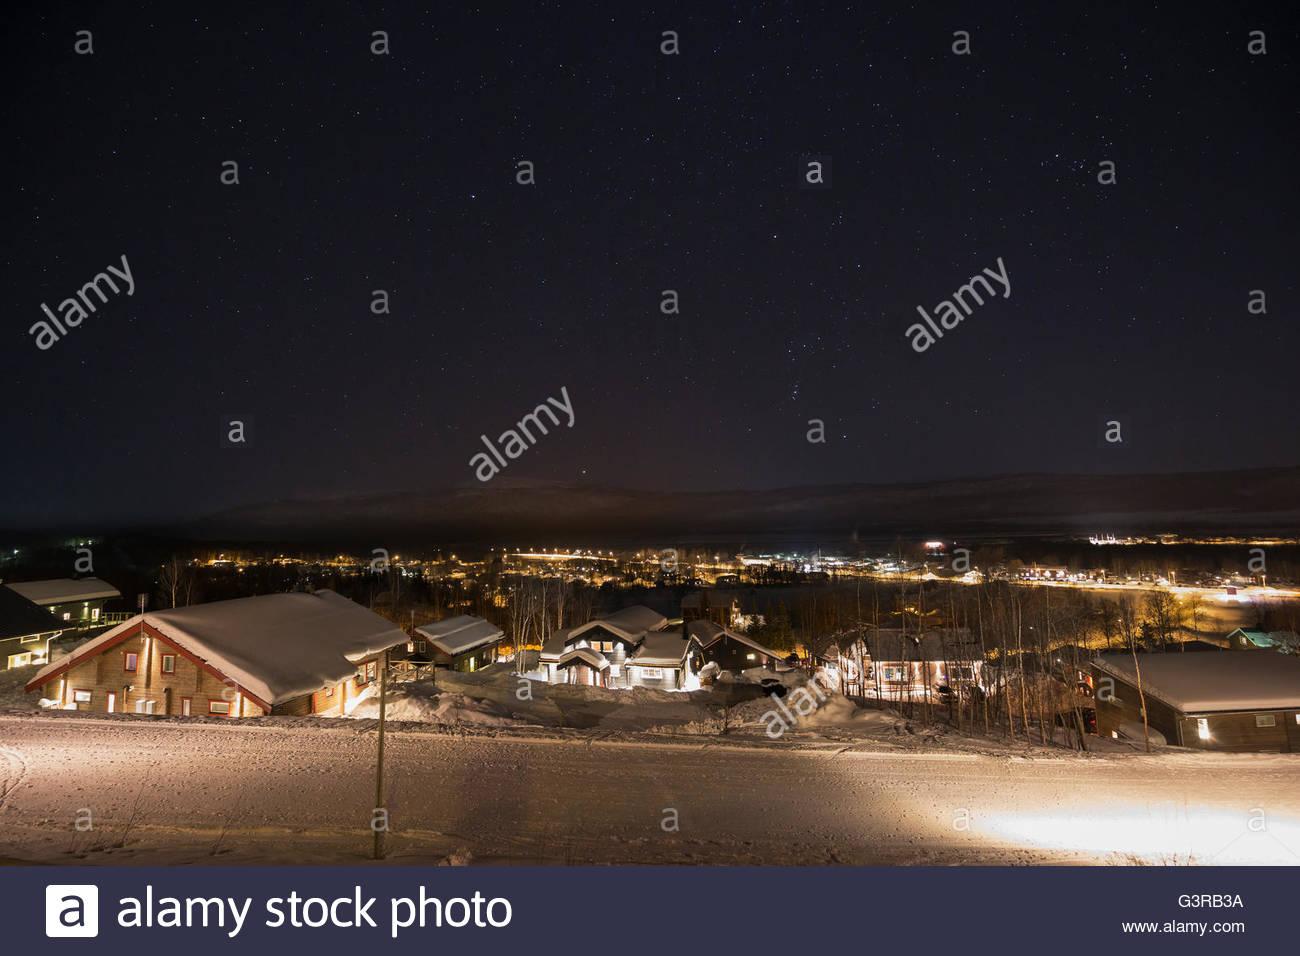 Sweden, Vasterbotten, Hemavan, Wooden houses at ski resort at night - Stock Image